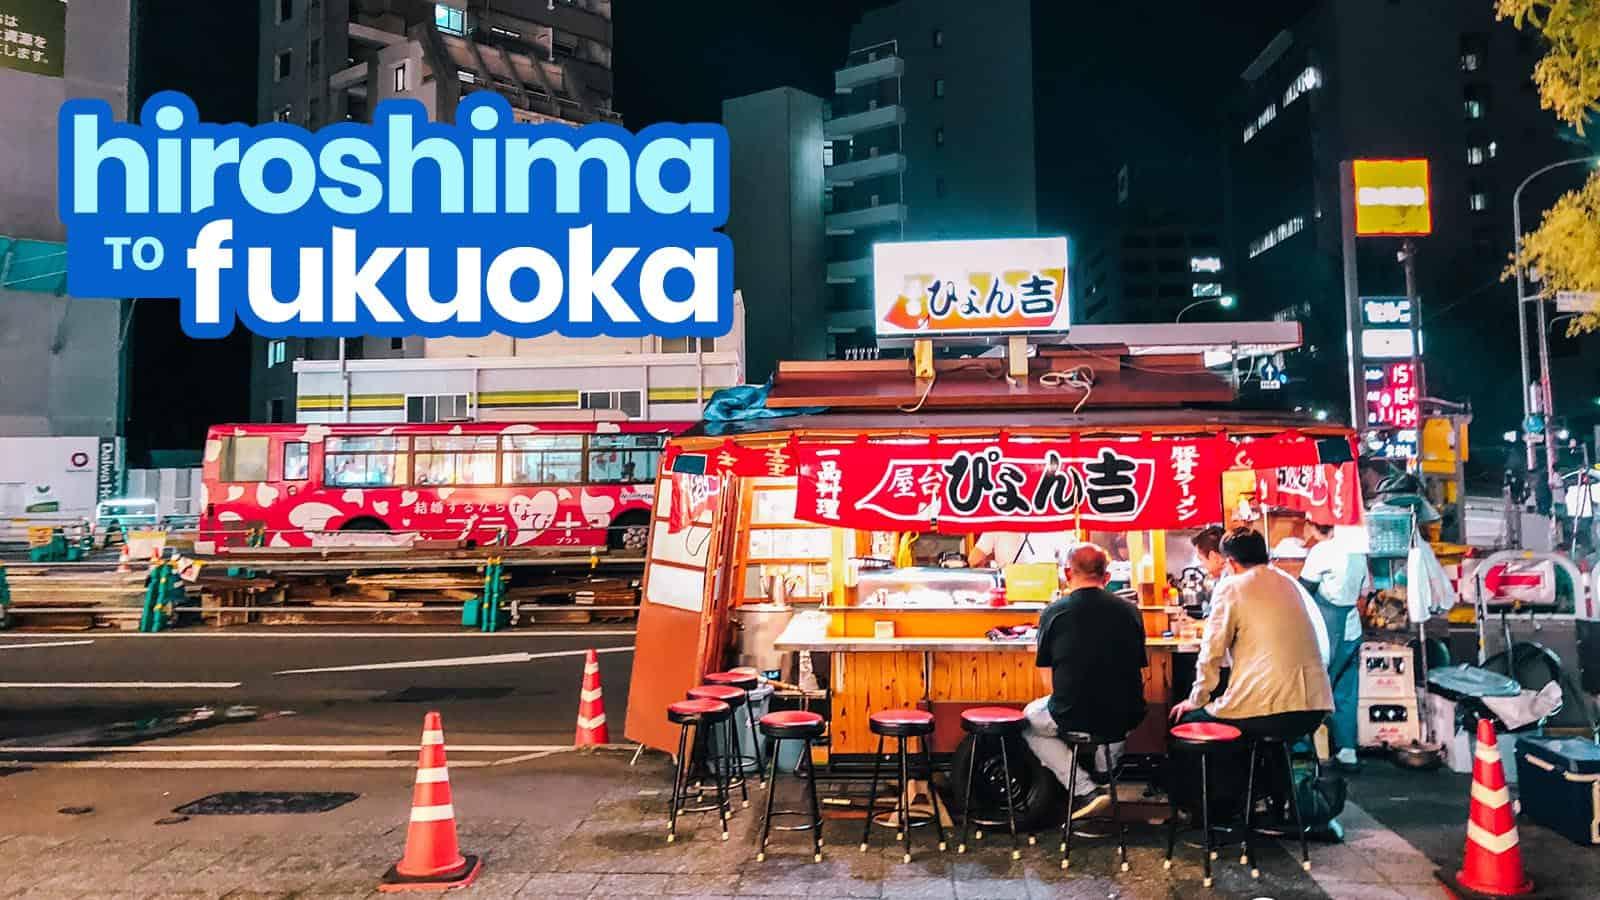 HIROSHIMA TO FUKUOKA AIRPORT or HAKATA STATION: By Bus and By Train